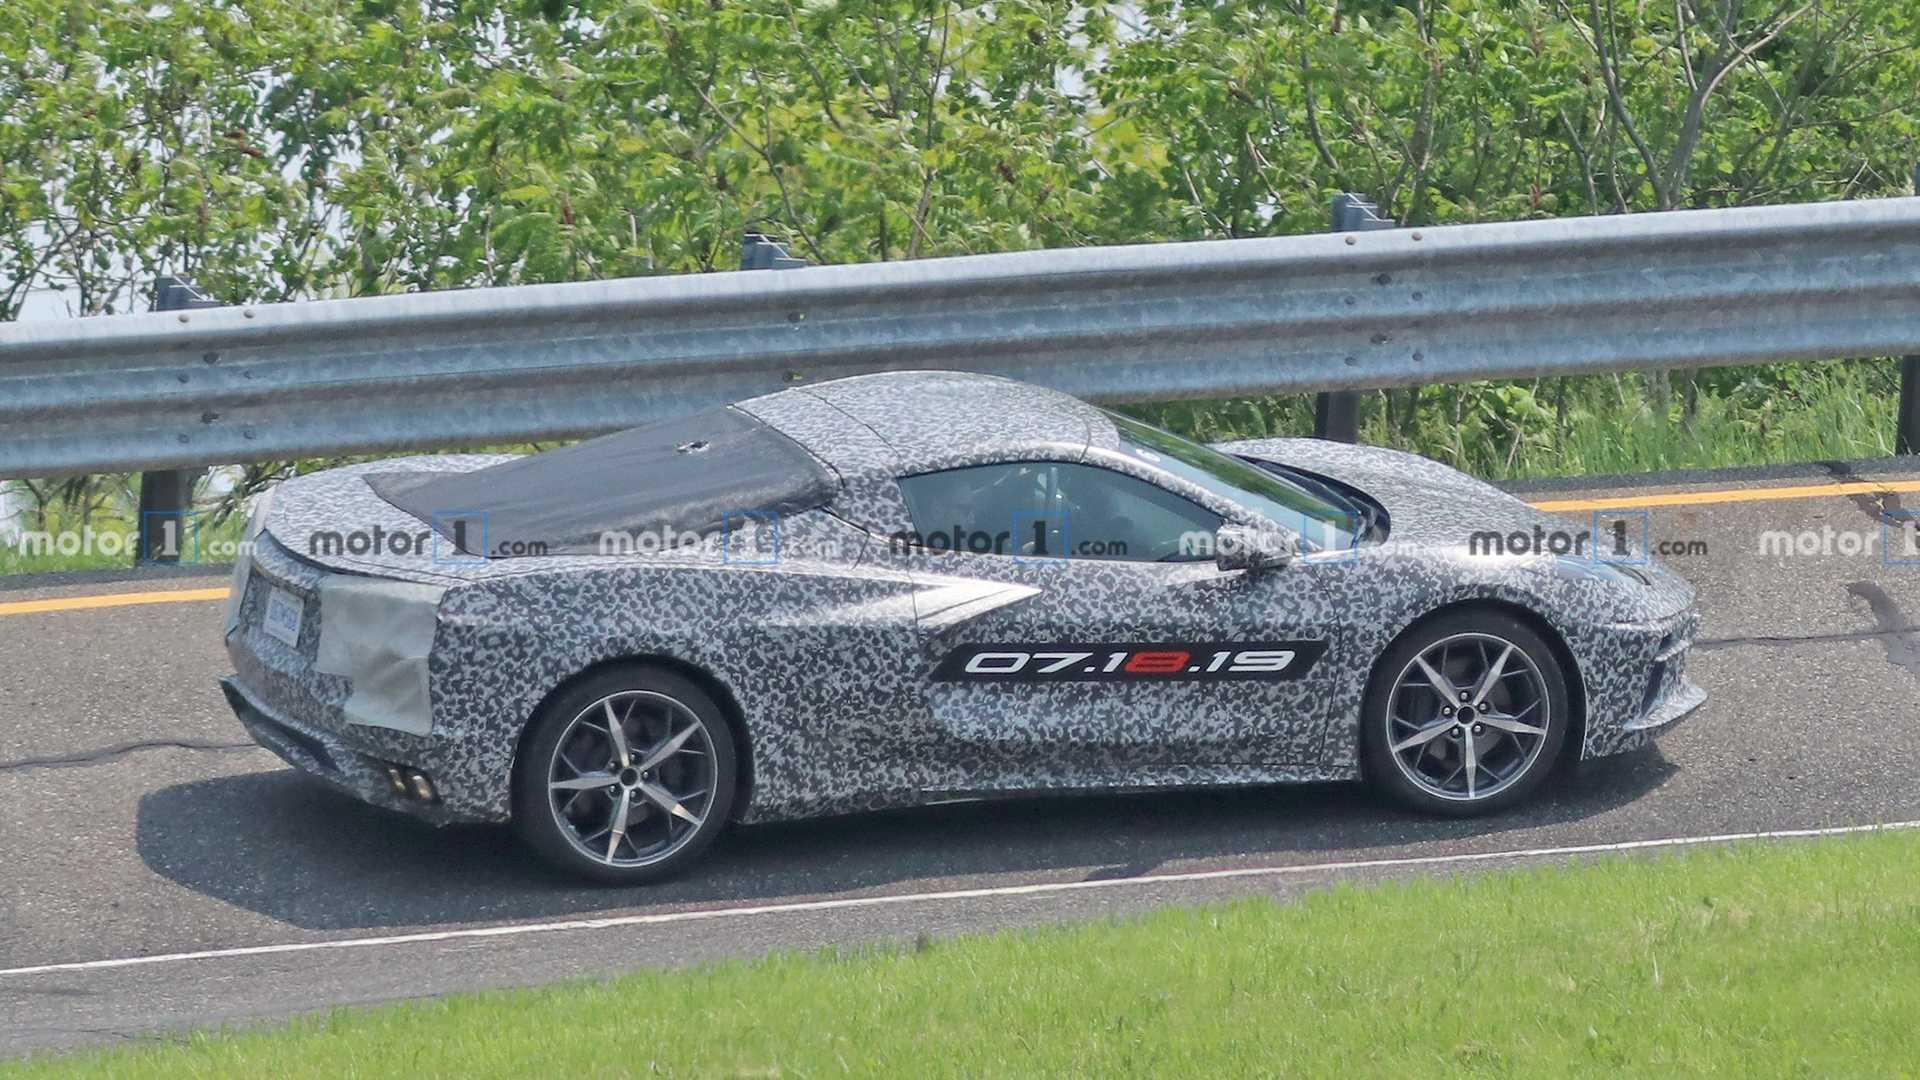 2019 - [Chevrolet] Corvette C8 Stingray - Page 4 C8-chevrolet-corvette-spy-photo